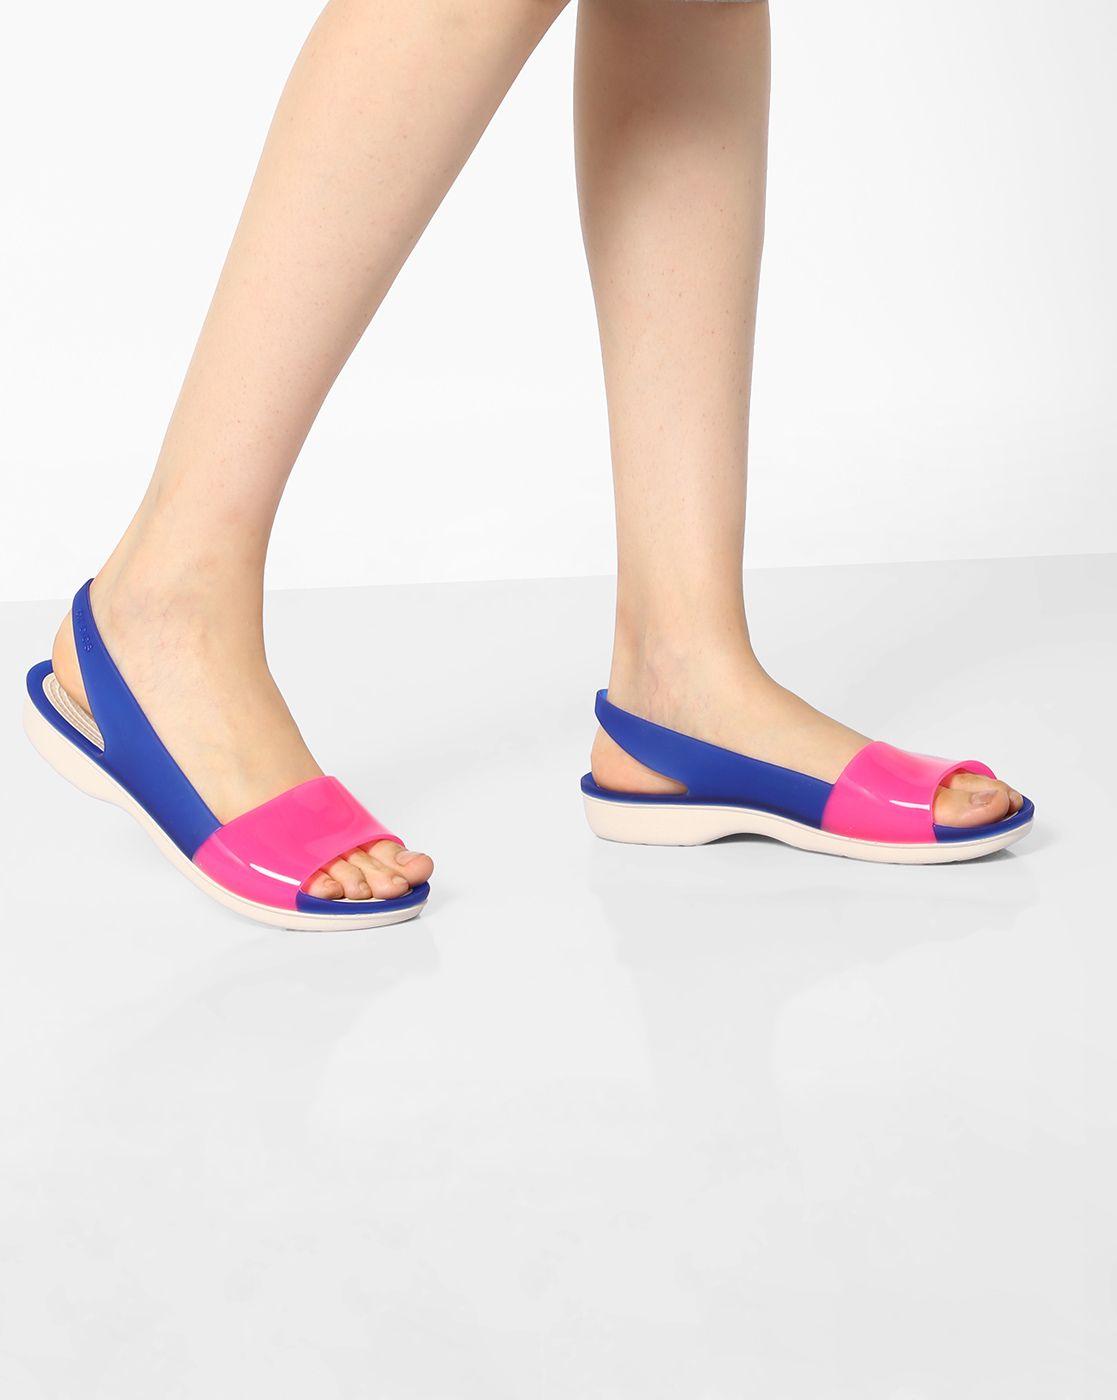 c6fce0a0c Crocs Blue   Pink Croslite Monsoon Sandals with Slingback Strap ...